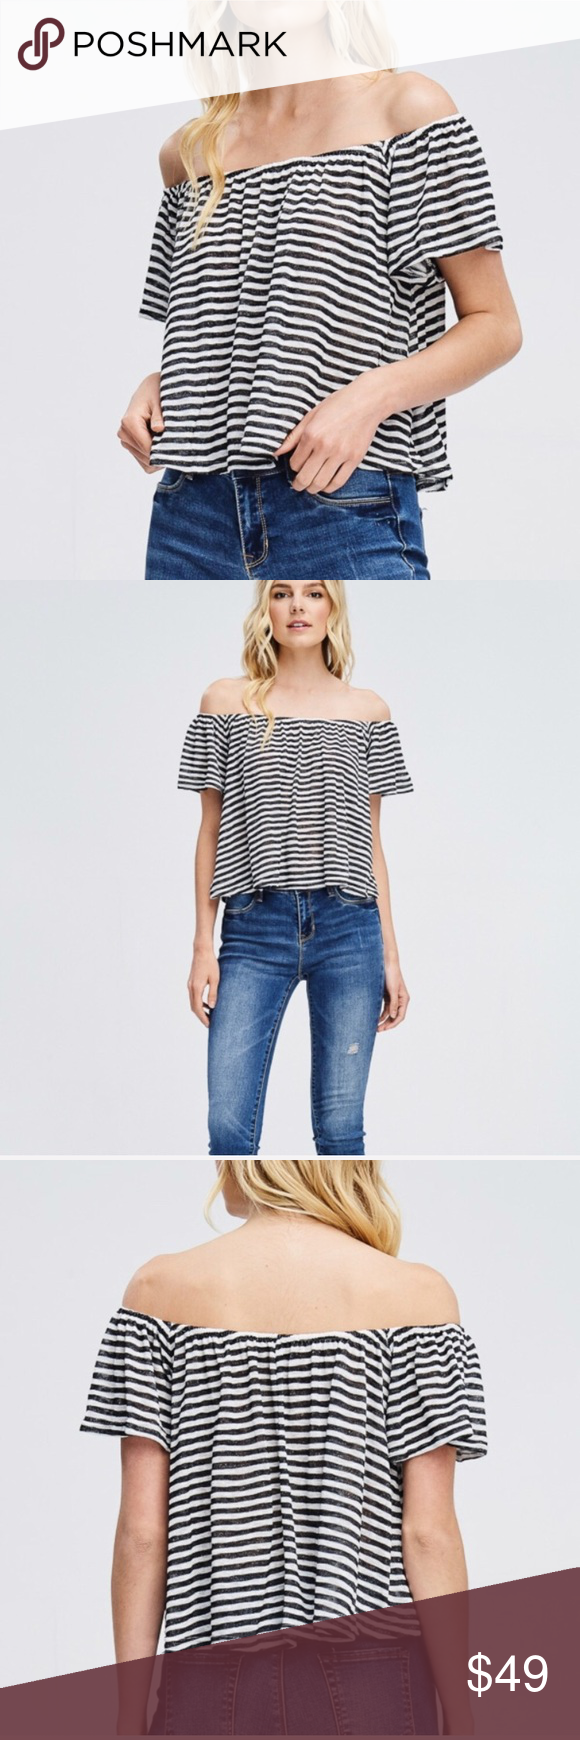 Black and white stripe offtheshoulder crop top boutique